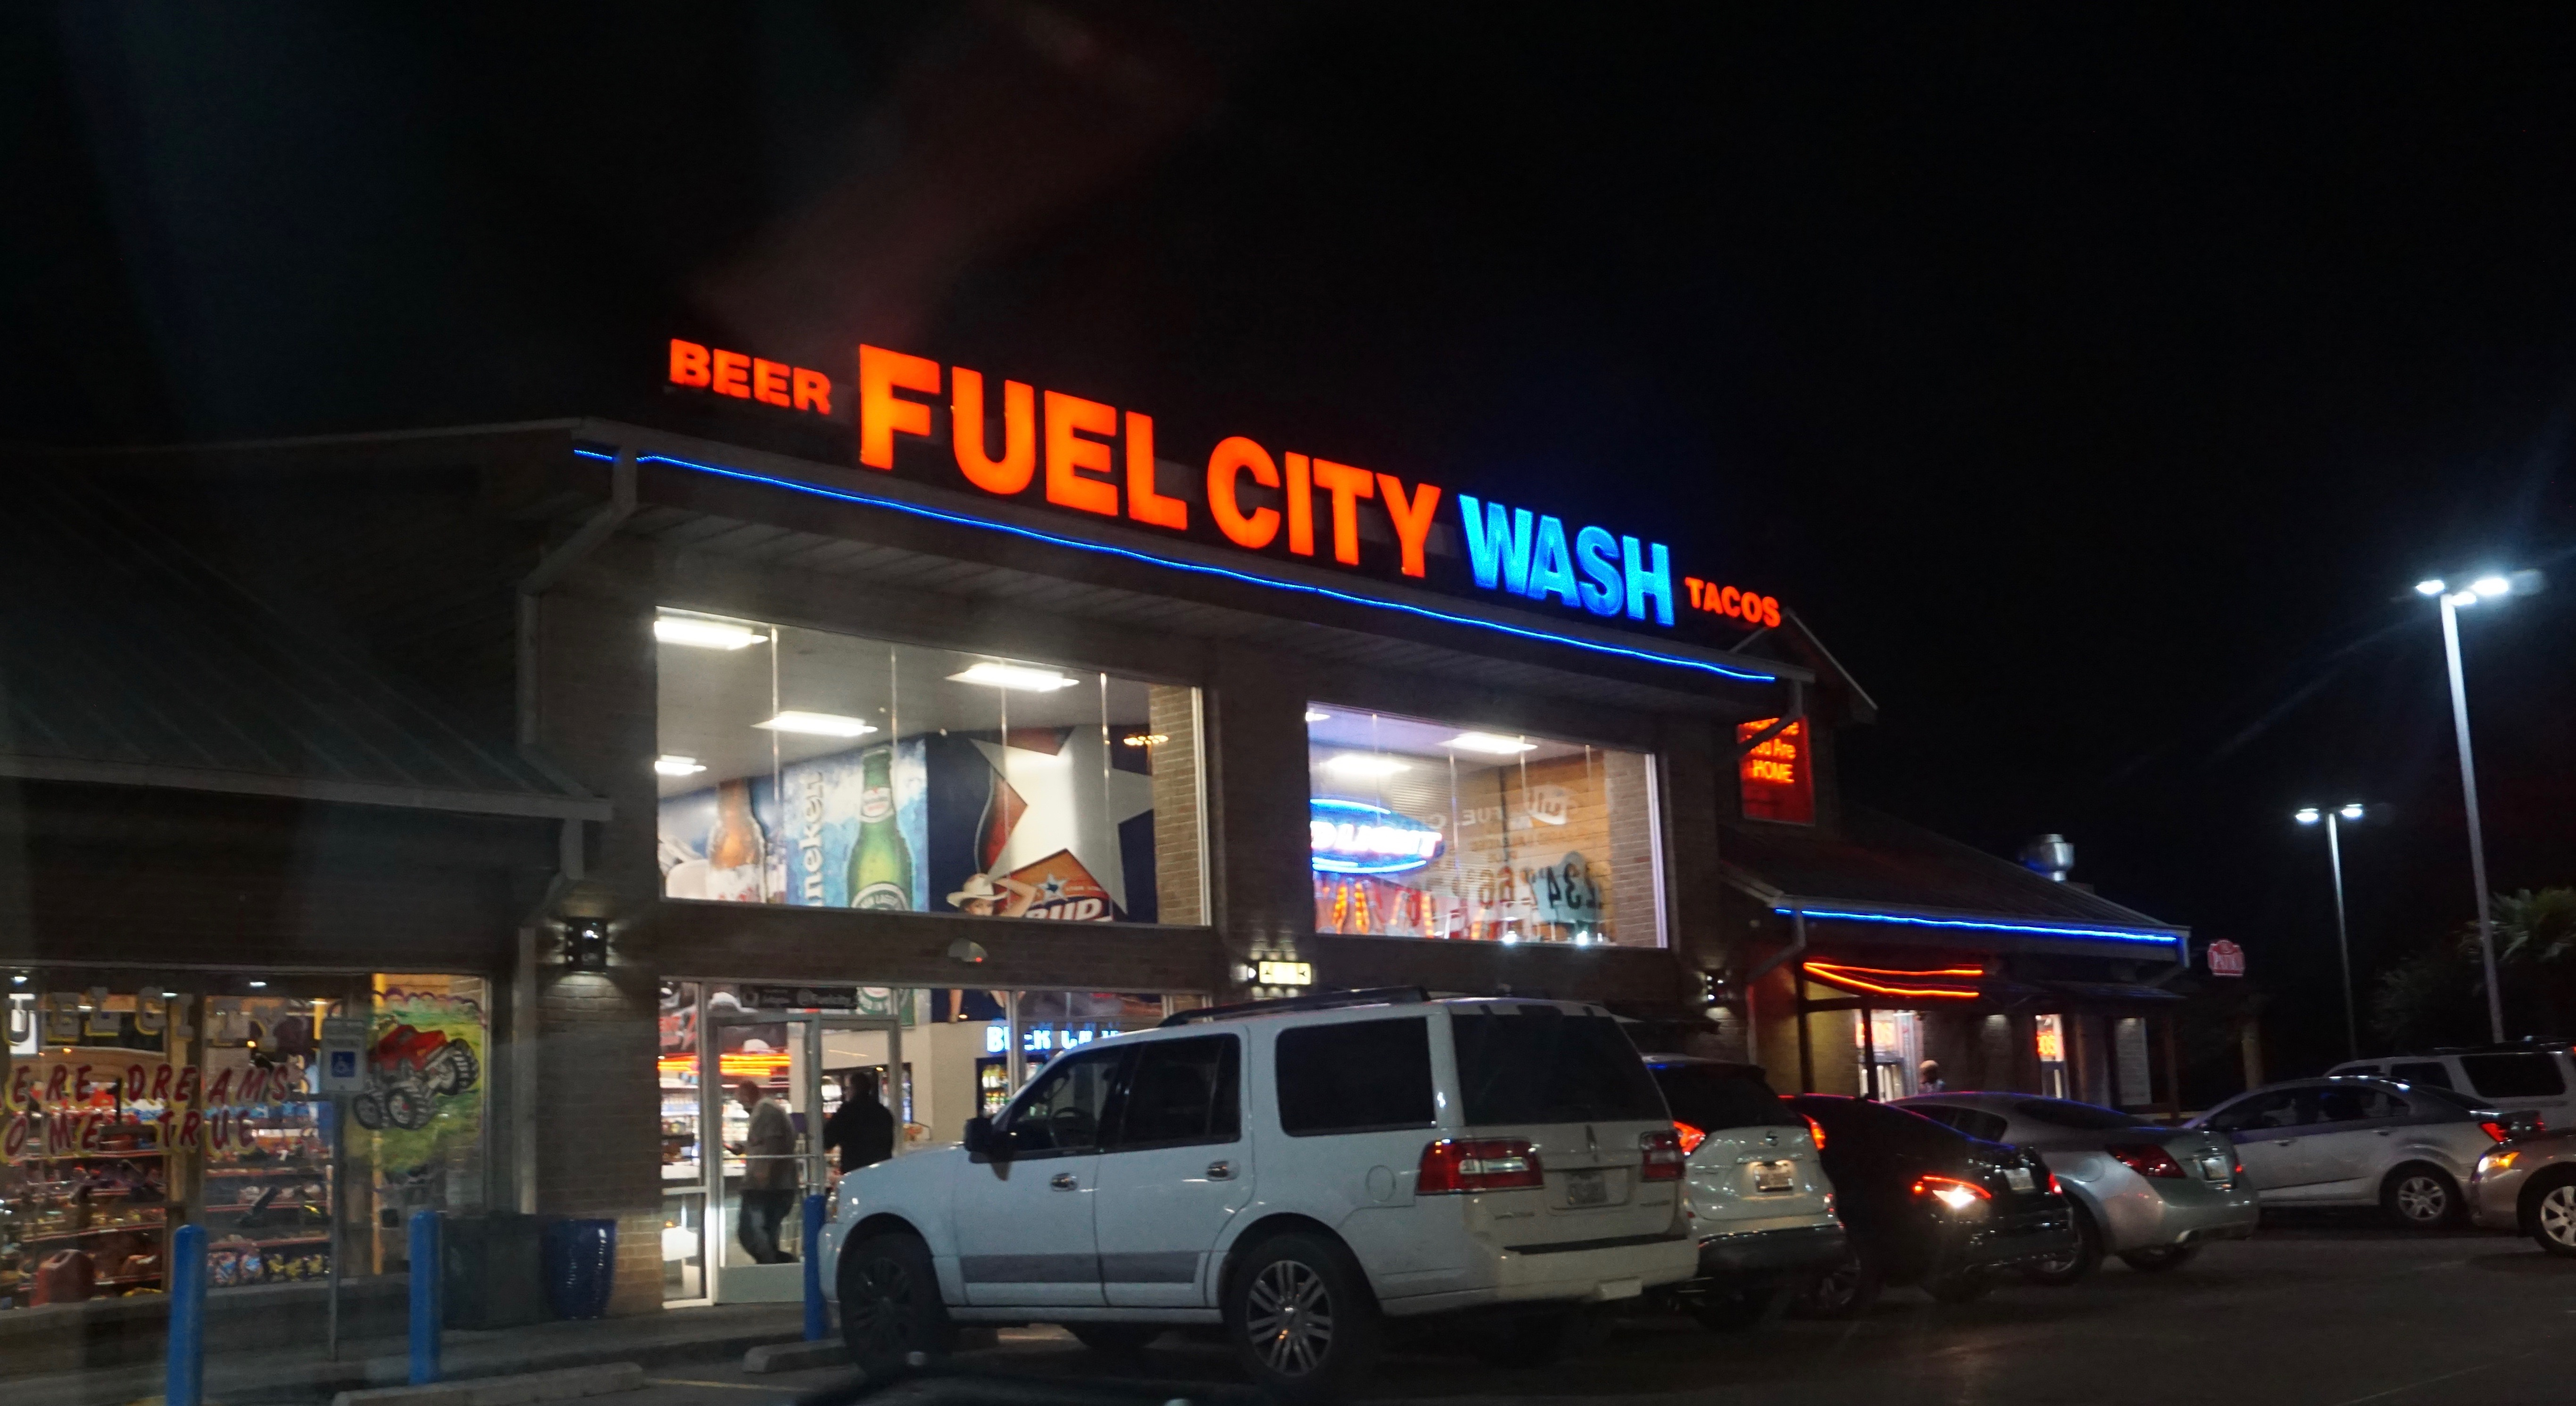 Fuel City